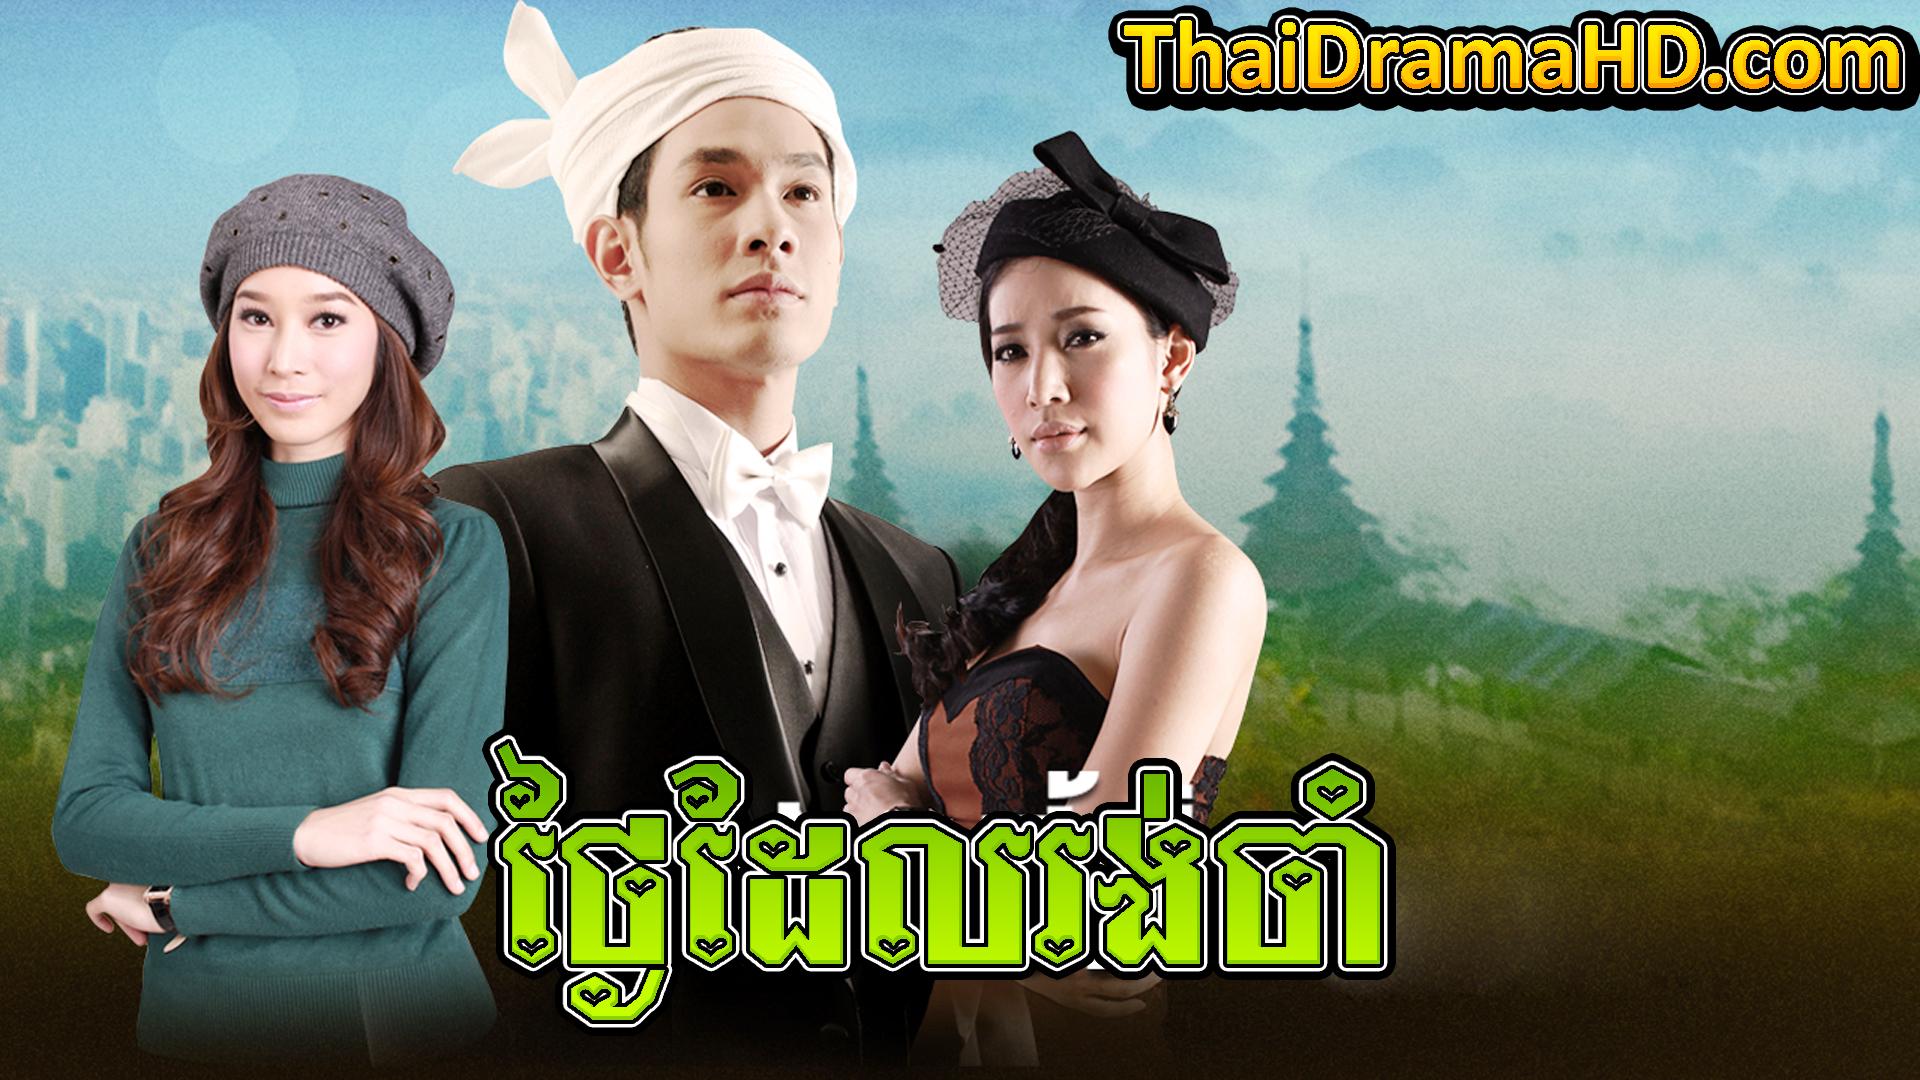 Thngay Del Rong Cham   Thai Drama   Thai Drama HD   Khmer Movie   Phumikhmer   Phumikhmer1   movie-khmer   video4khmer   khmotions   kolabkhmer   khmer drama   ksdrama   cookingtips   roscheat   khmertimeskh   khmerkomsan   phumi7   merlkon   film2us   movie2kh   sweetdrama   khmercitylove   khreplay   tvb cambodia drama   ckh7   srokthai   phumimedia   phumi8   khmer avenue   khmer search   Soyo   khmerfans